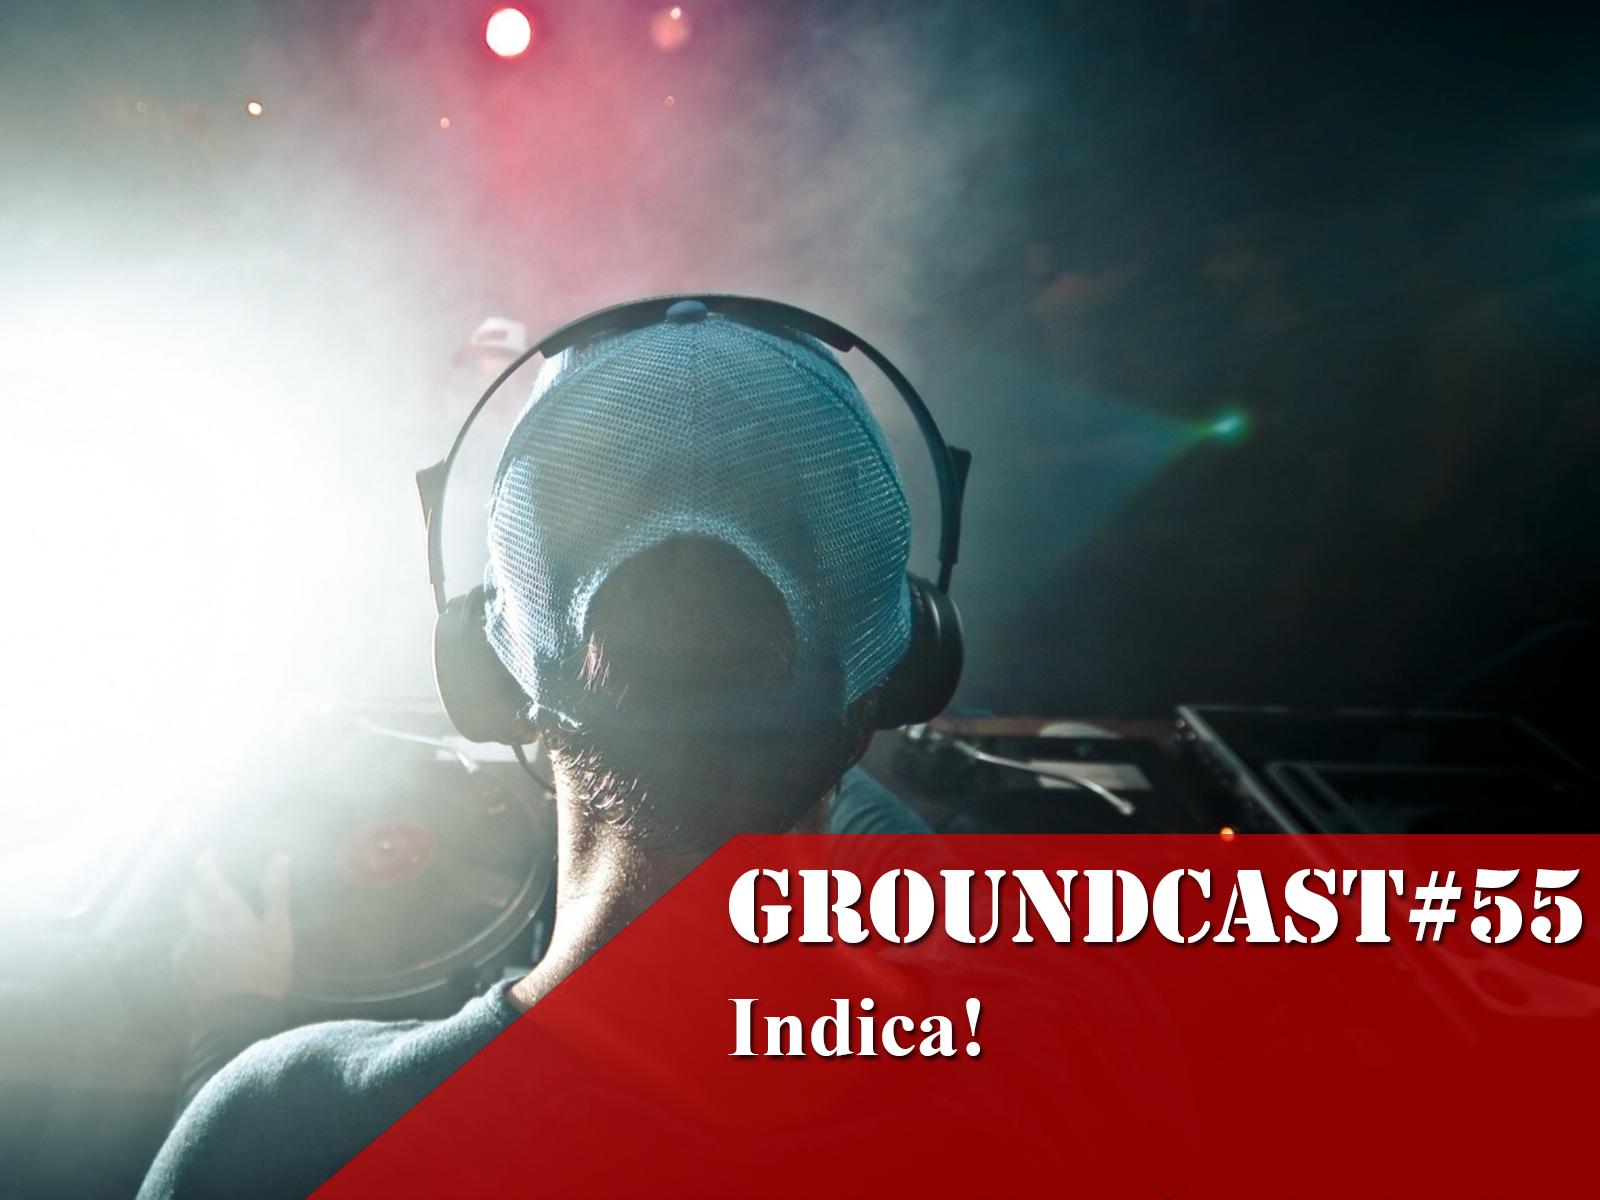 Groundcast#55 – Indica!